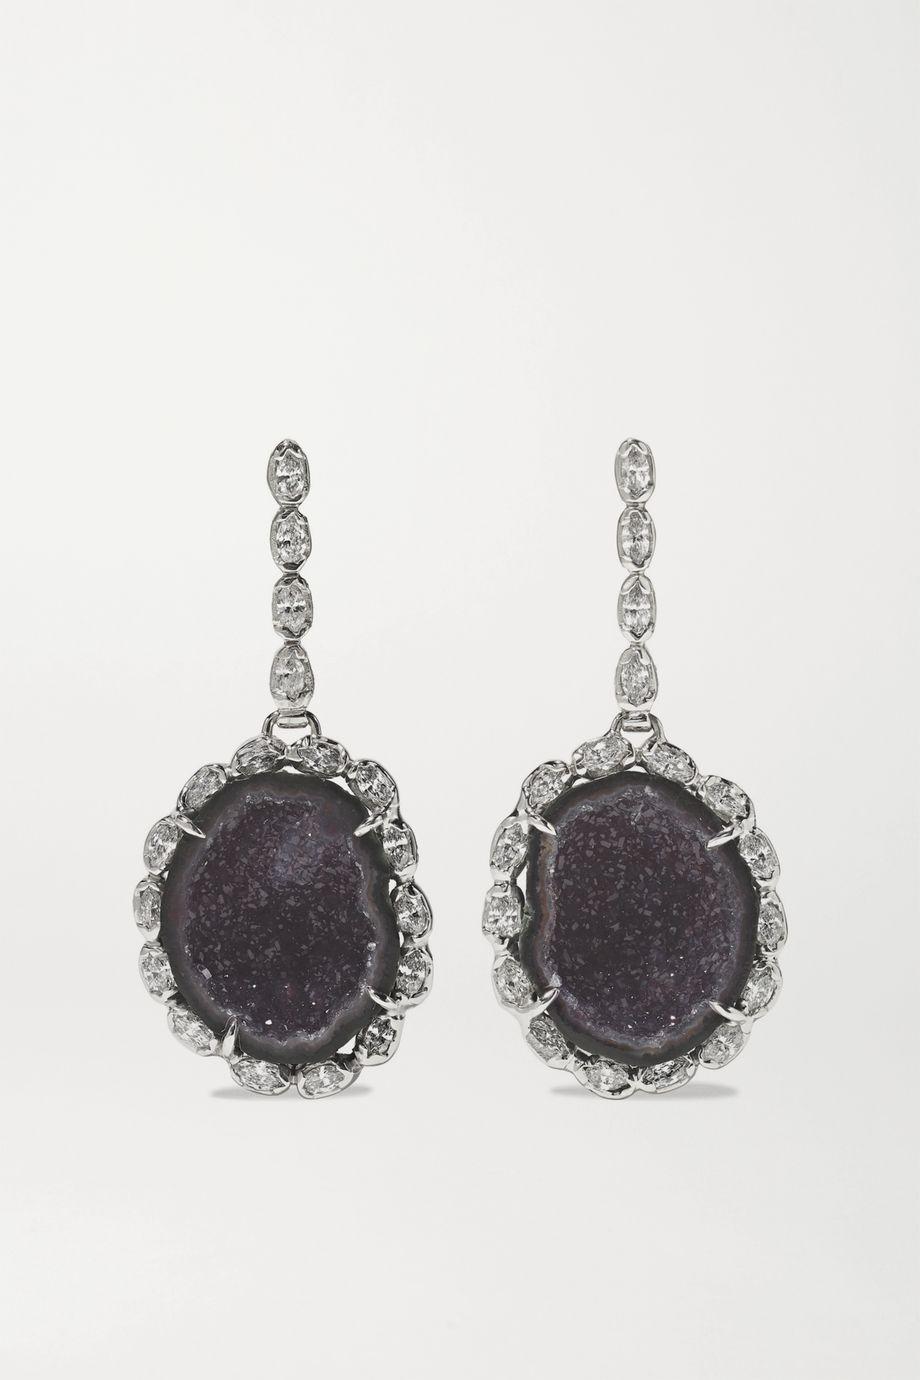 Kimberly McDonald 18-karat white gold, geode and diamond earrings